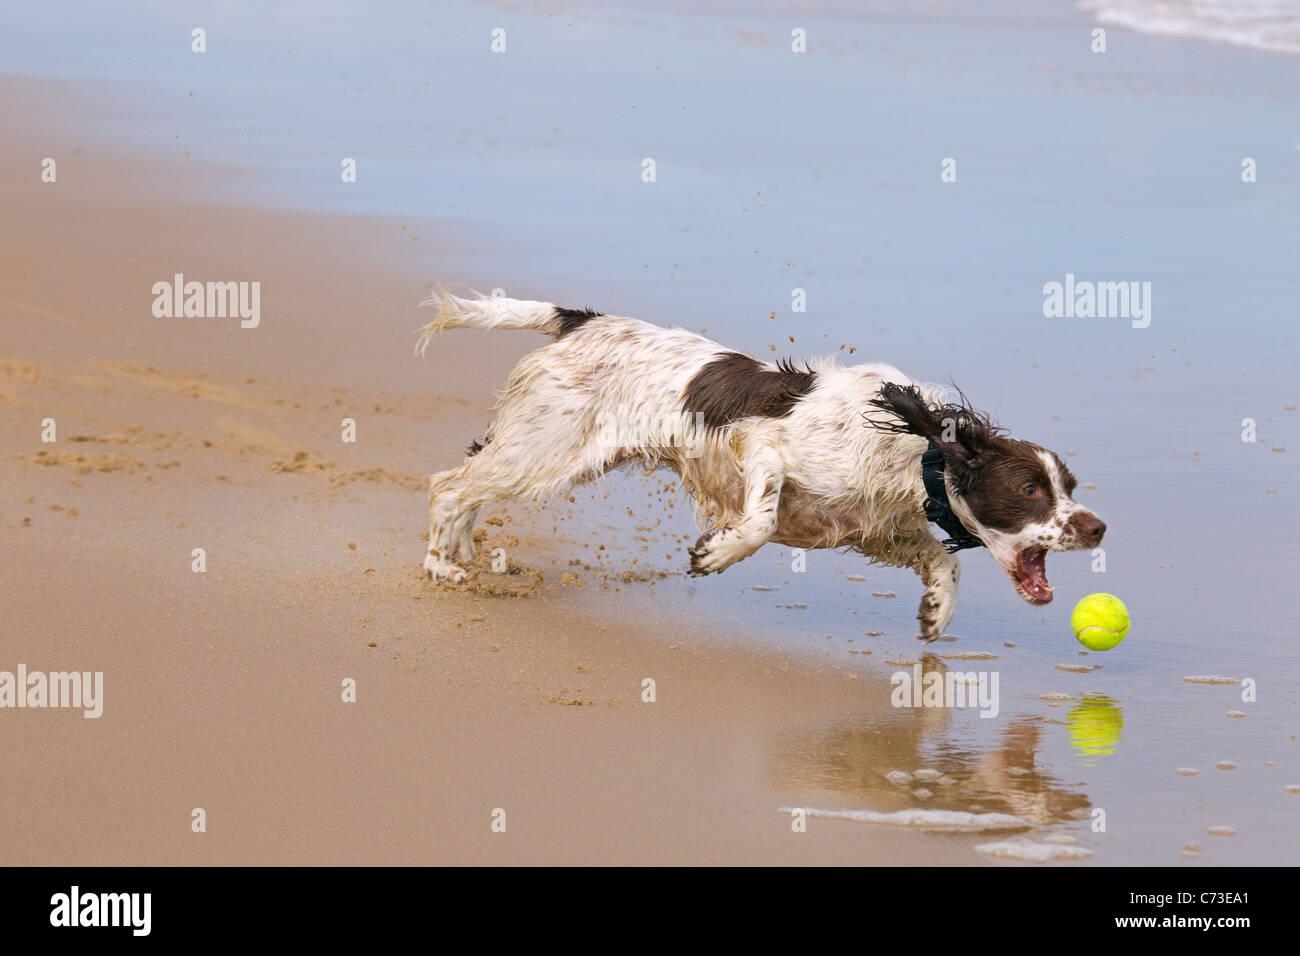 English Springer Spaniel chasing ball on beach Stock Photo